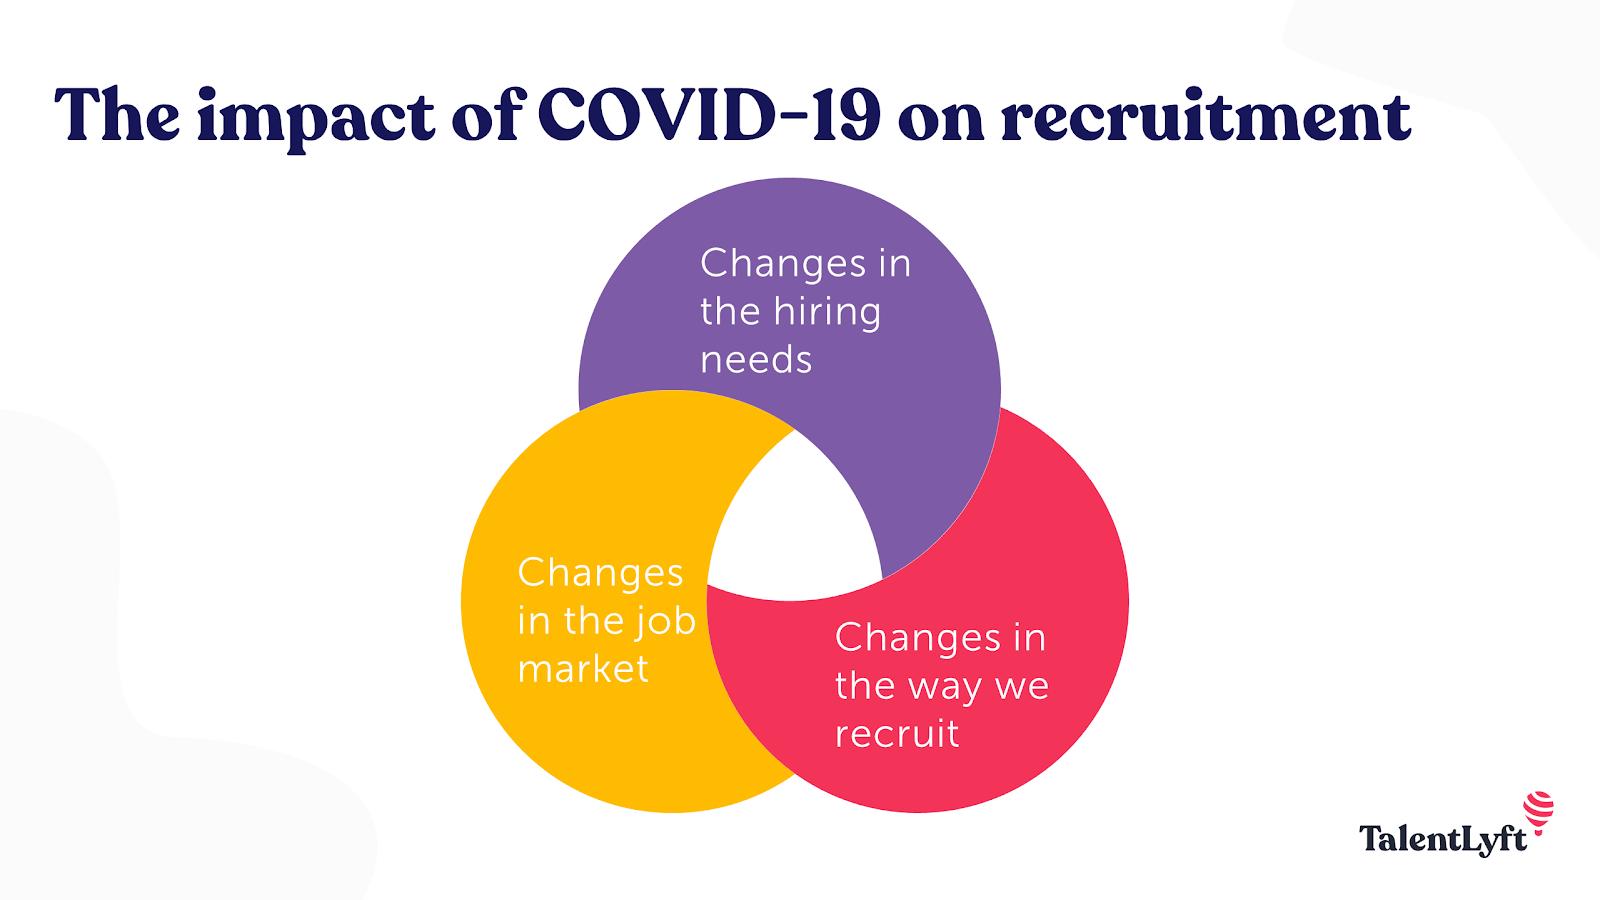 Impact of Covid-19 on recruitment